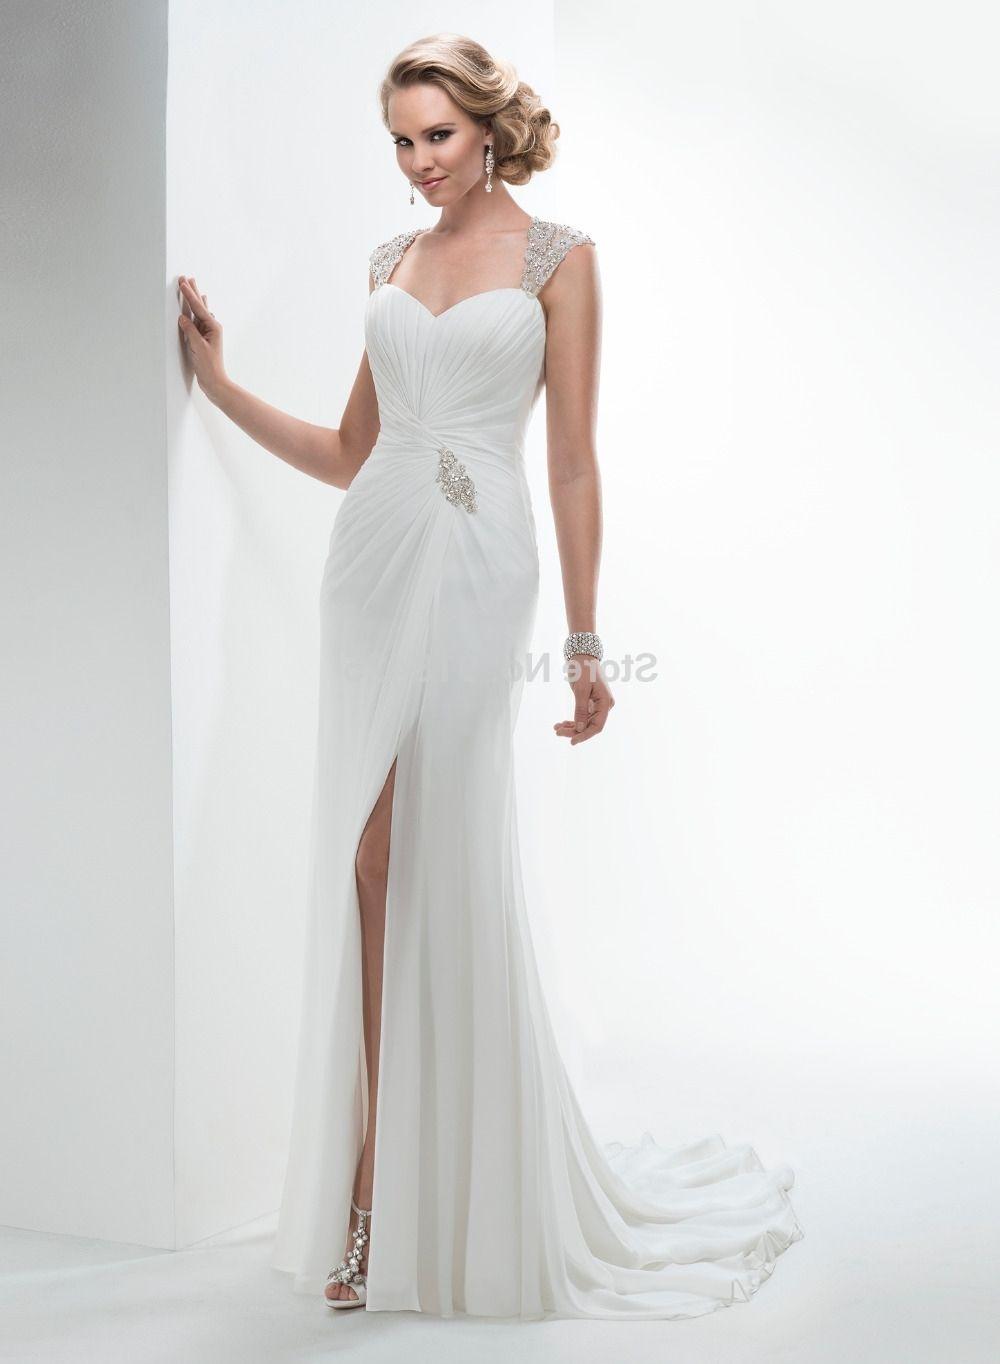 Macy S Wedding Dresses.Macys Bridal Gowns Designers Raveitsafe